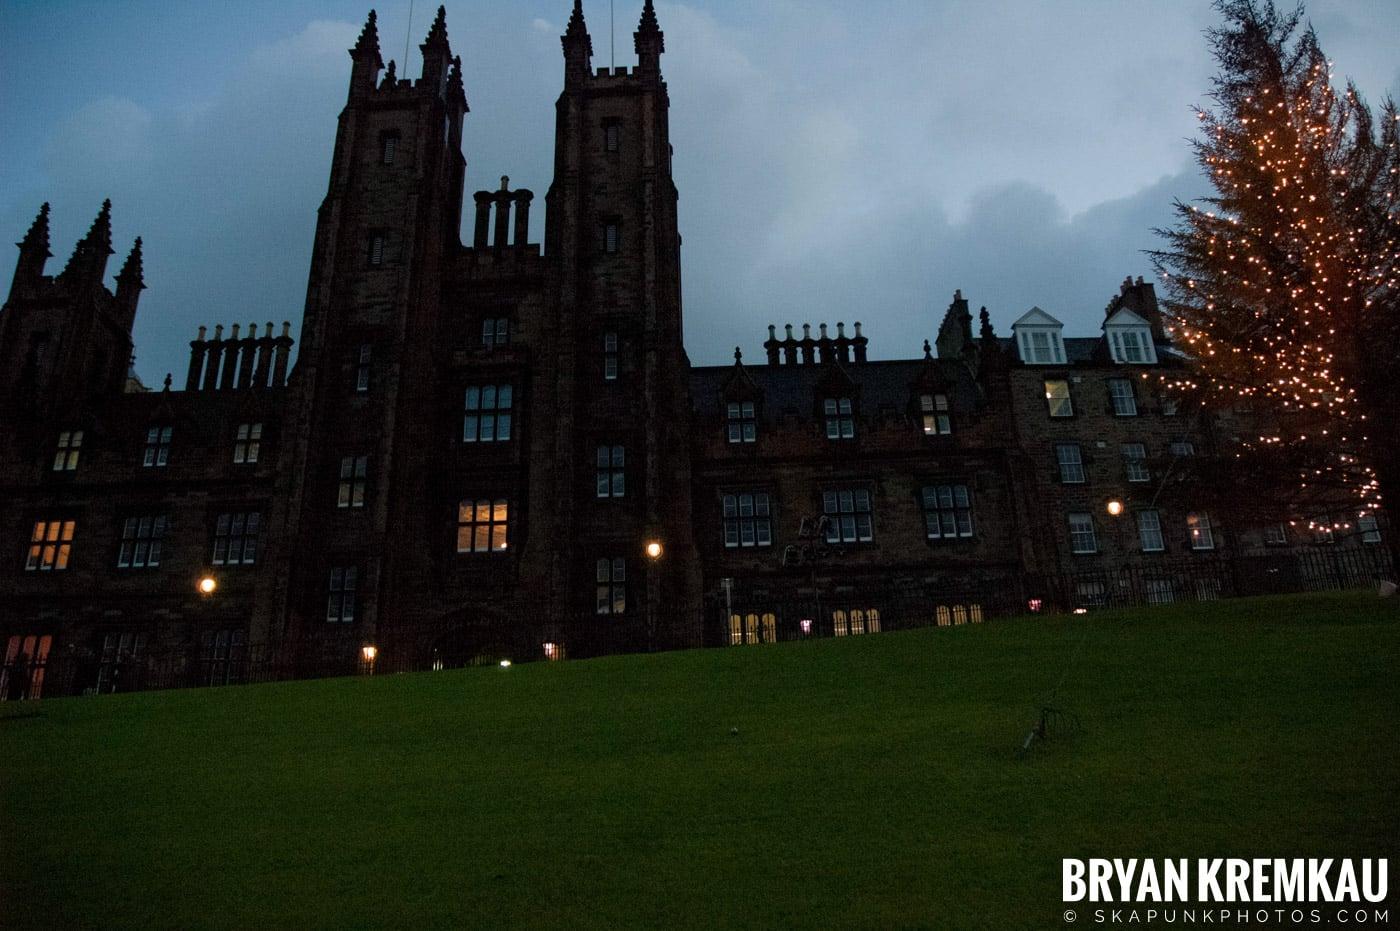 Edinburgh, Scotland - Day 1 - 12.12.06 (15)